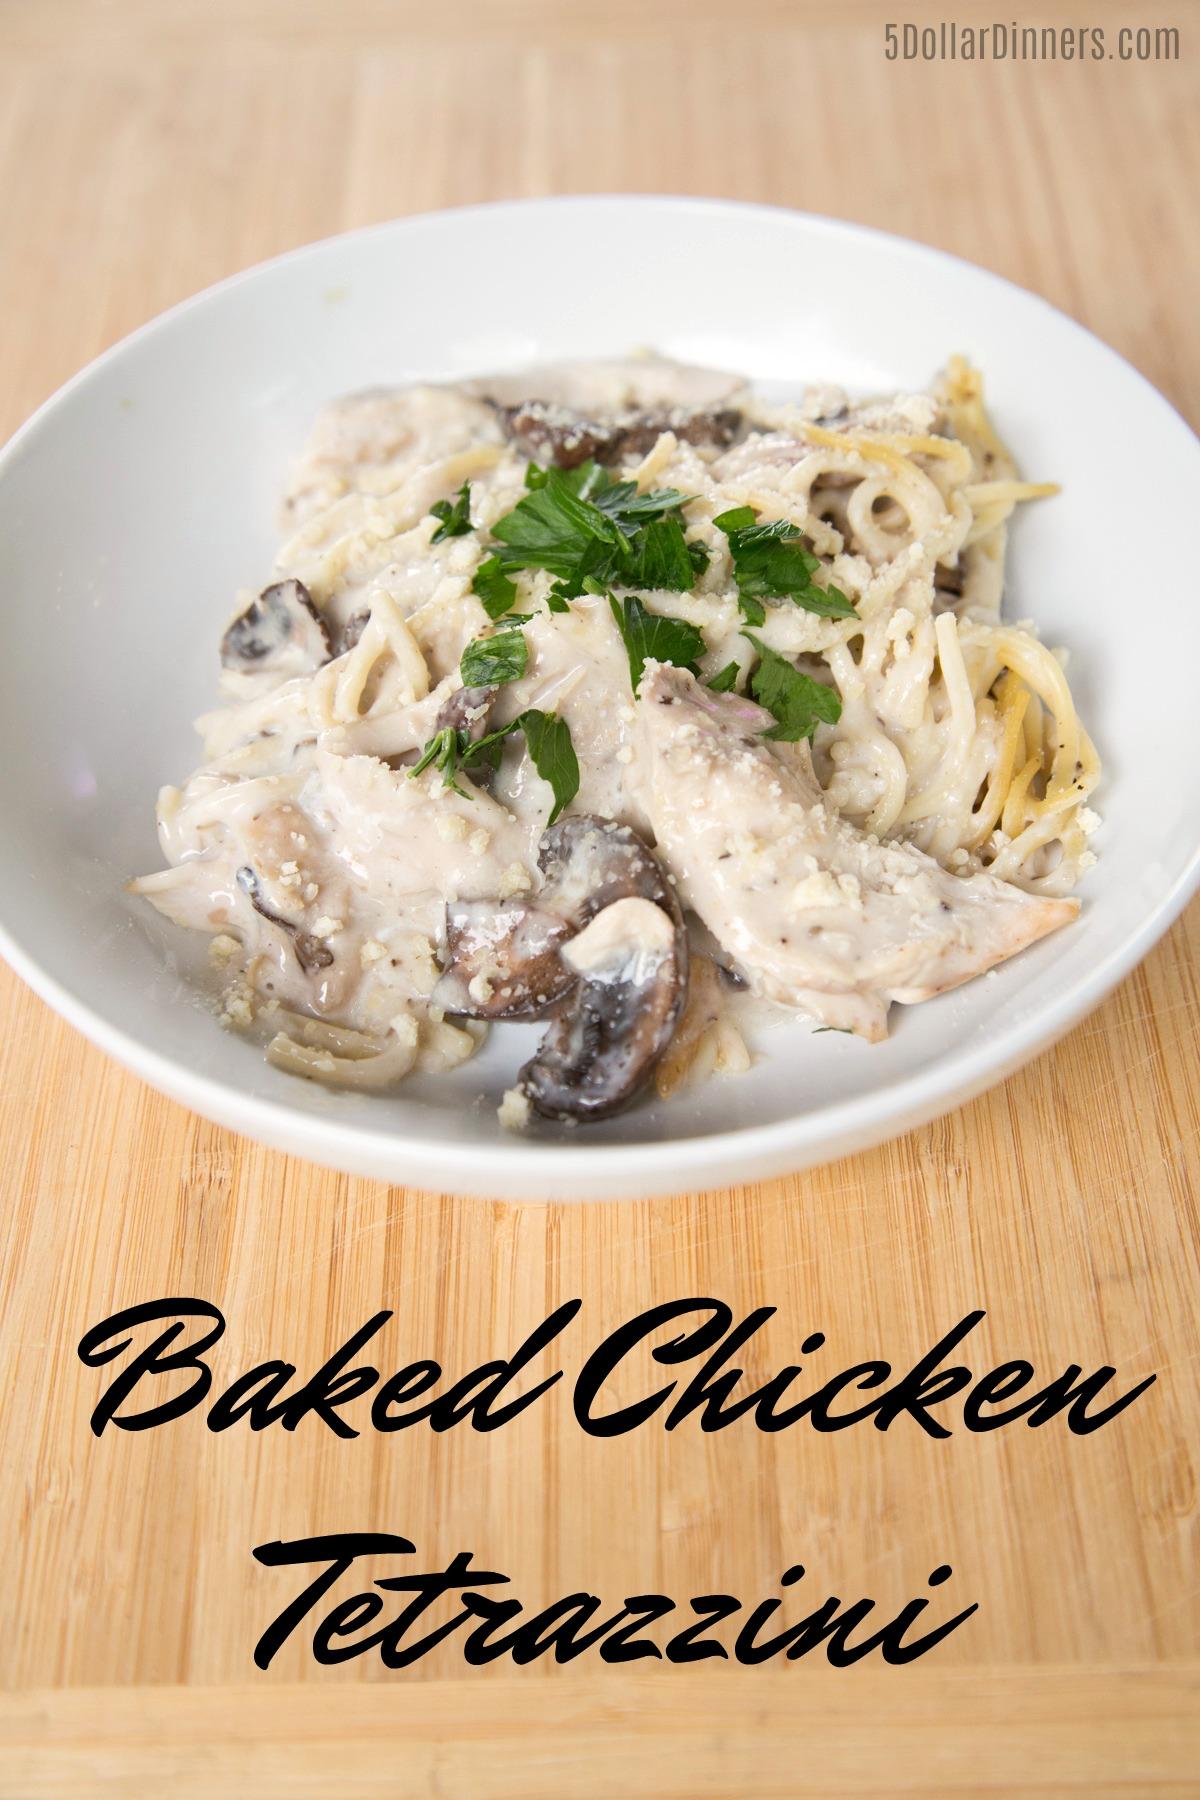 Baked Chicken Tetrazzini Recipe from 5DollarDinners.com